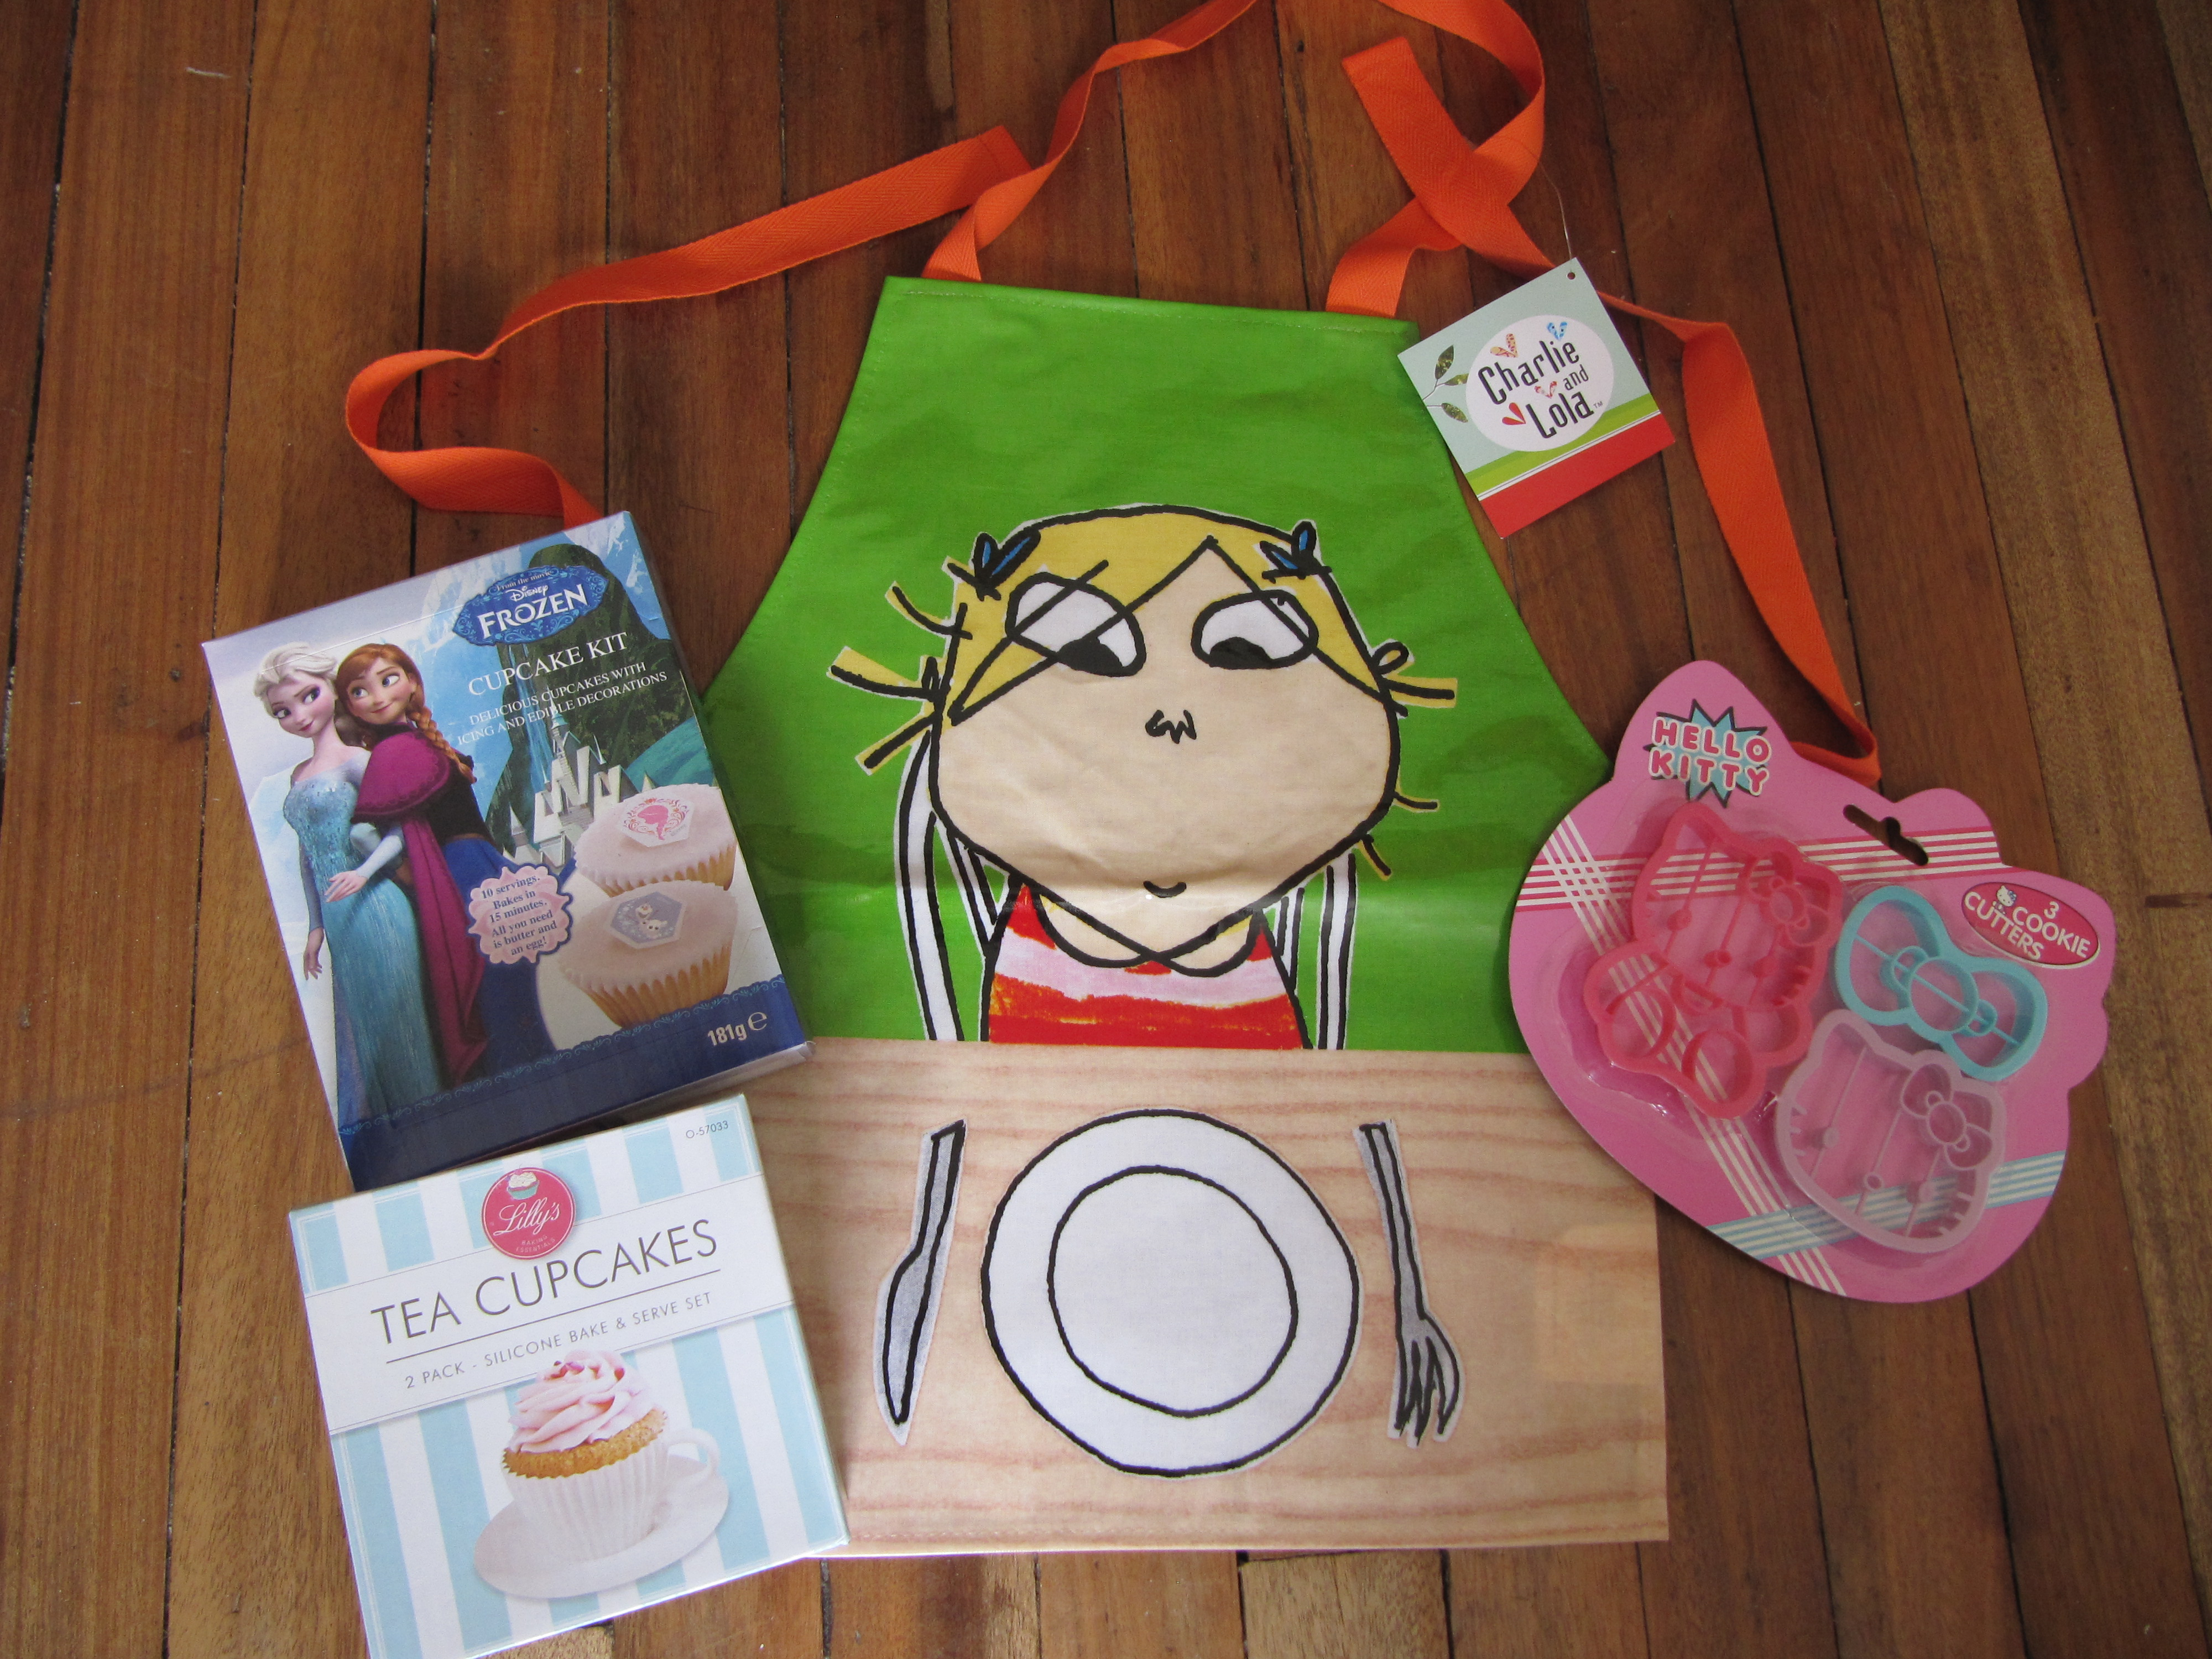 White apron poundland - A Charlie Lola Apron 99p Hb Hello Kitty Cookie Cutters 49p Hb Tea Cupcakes 1 Poundworld A Frozen Cupcake Set 99p Hb